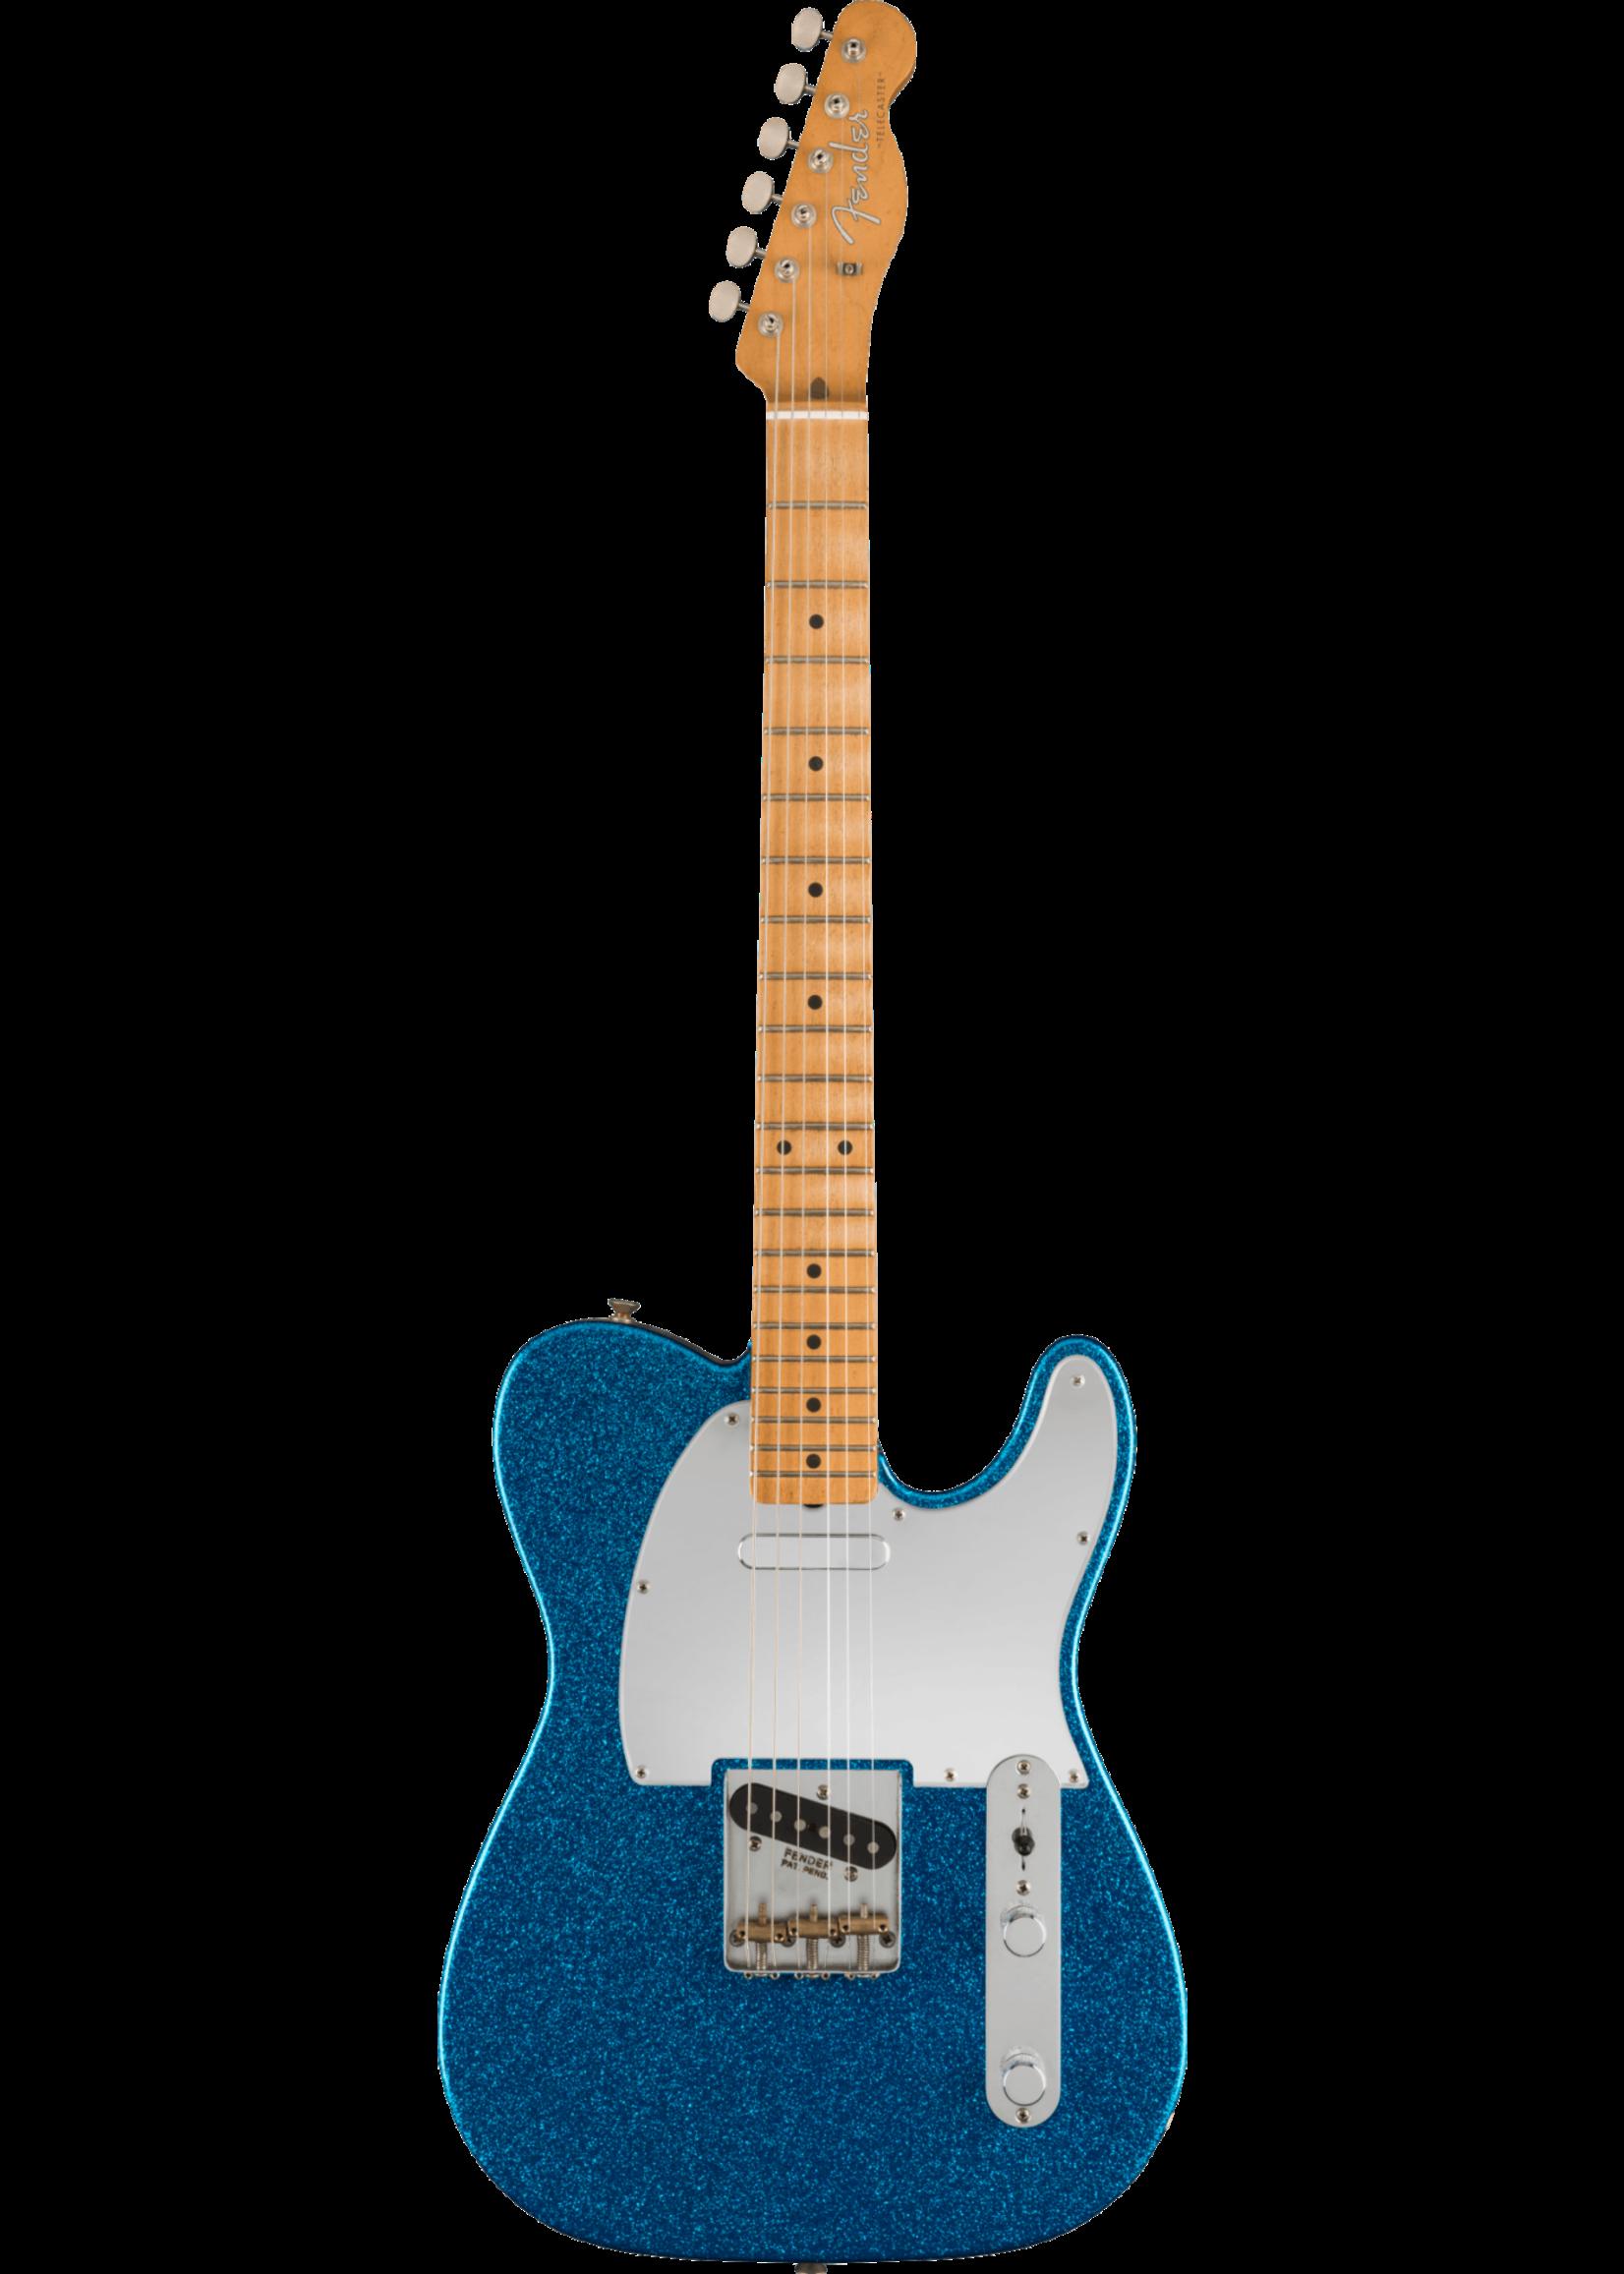 Fender Fender J Mascis Telecaster Bottle Rocket Blue Flake